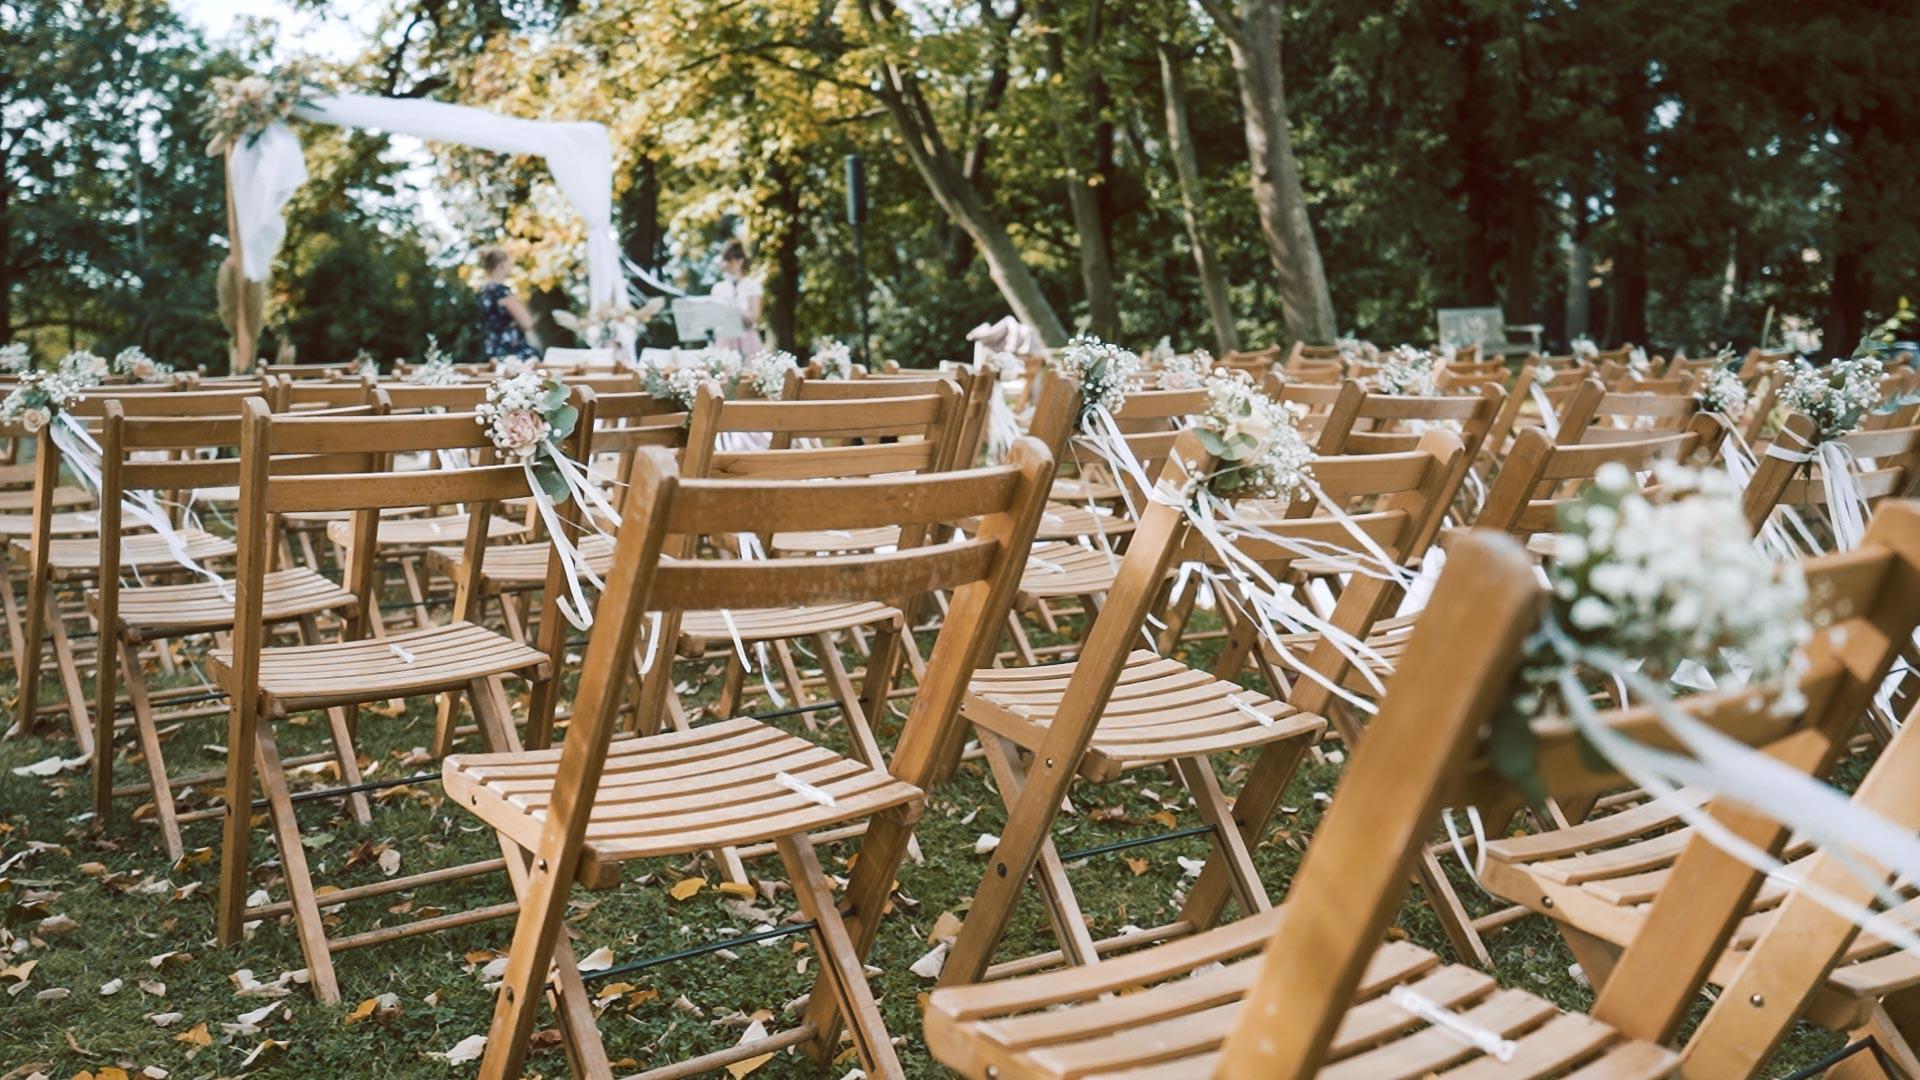 Pascal & Jenny Hochzeitsfilm Schloss Vettelhoven Videograf Hochzeit Filmemacher 022